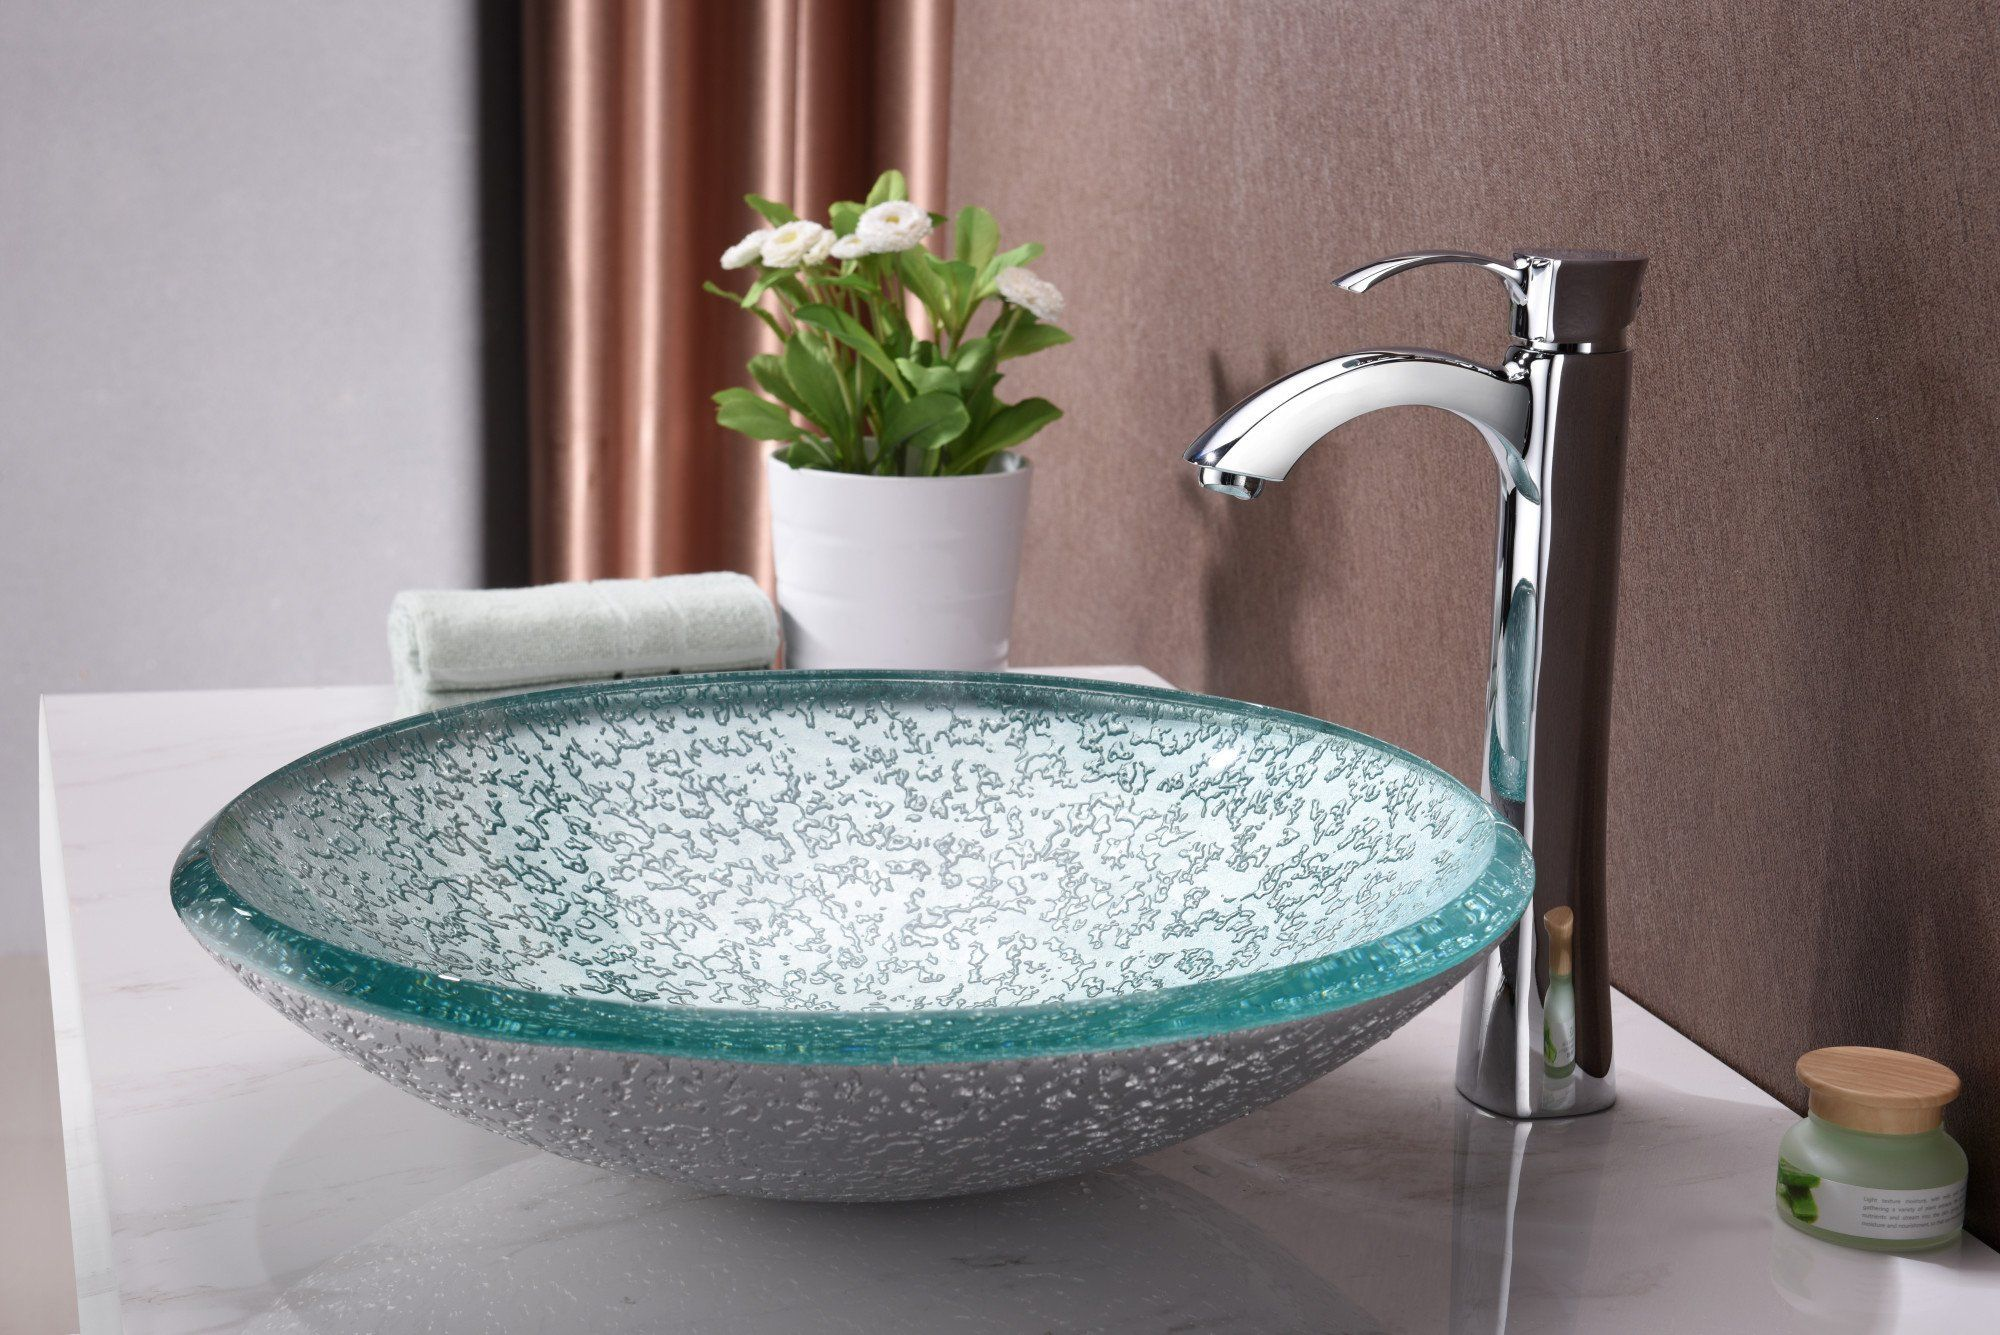 ANZZI Arc Series LS-AZ208 Vessel Sink - Glass | Sink ...